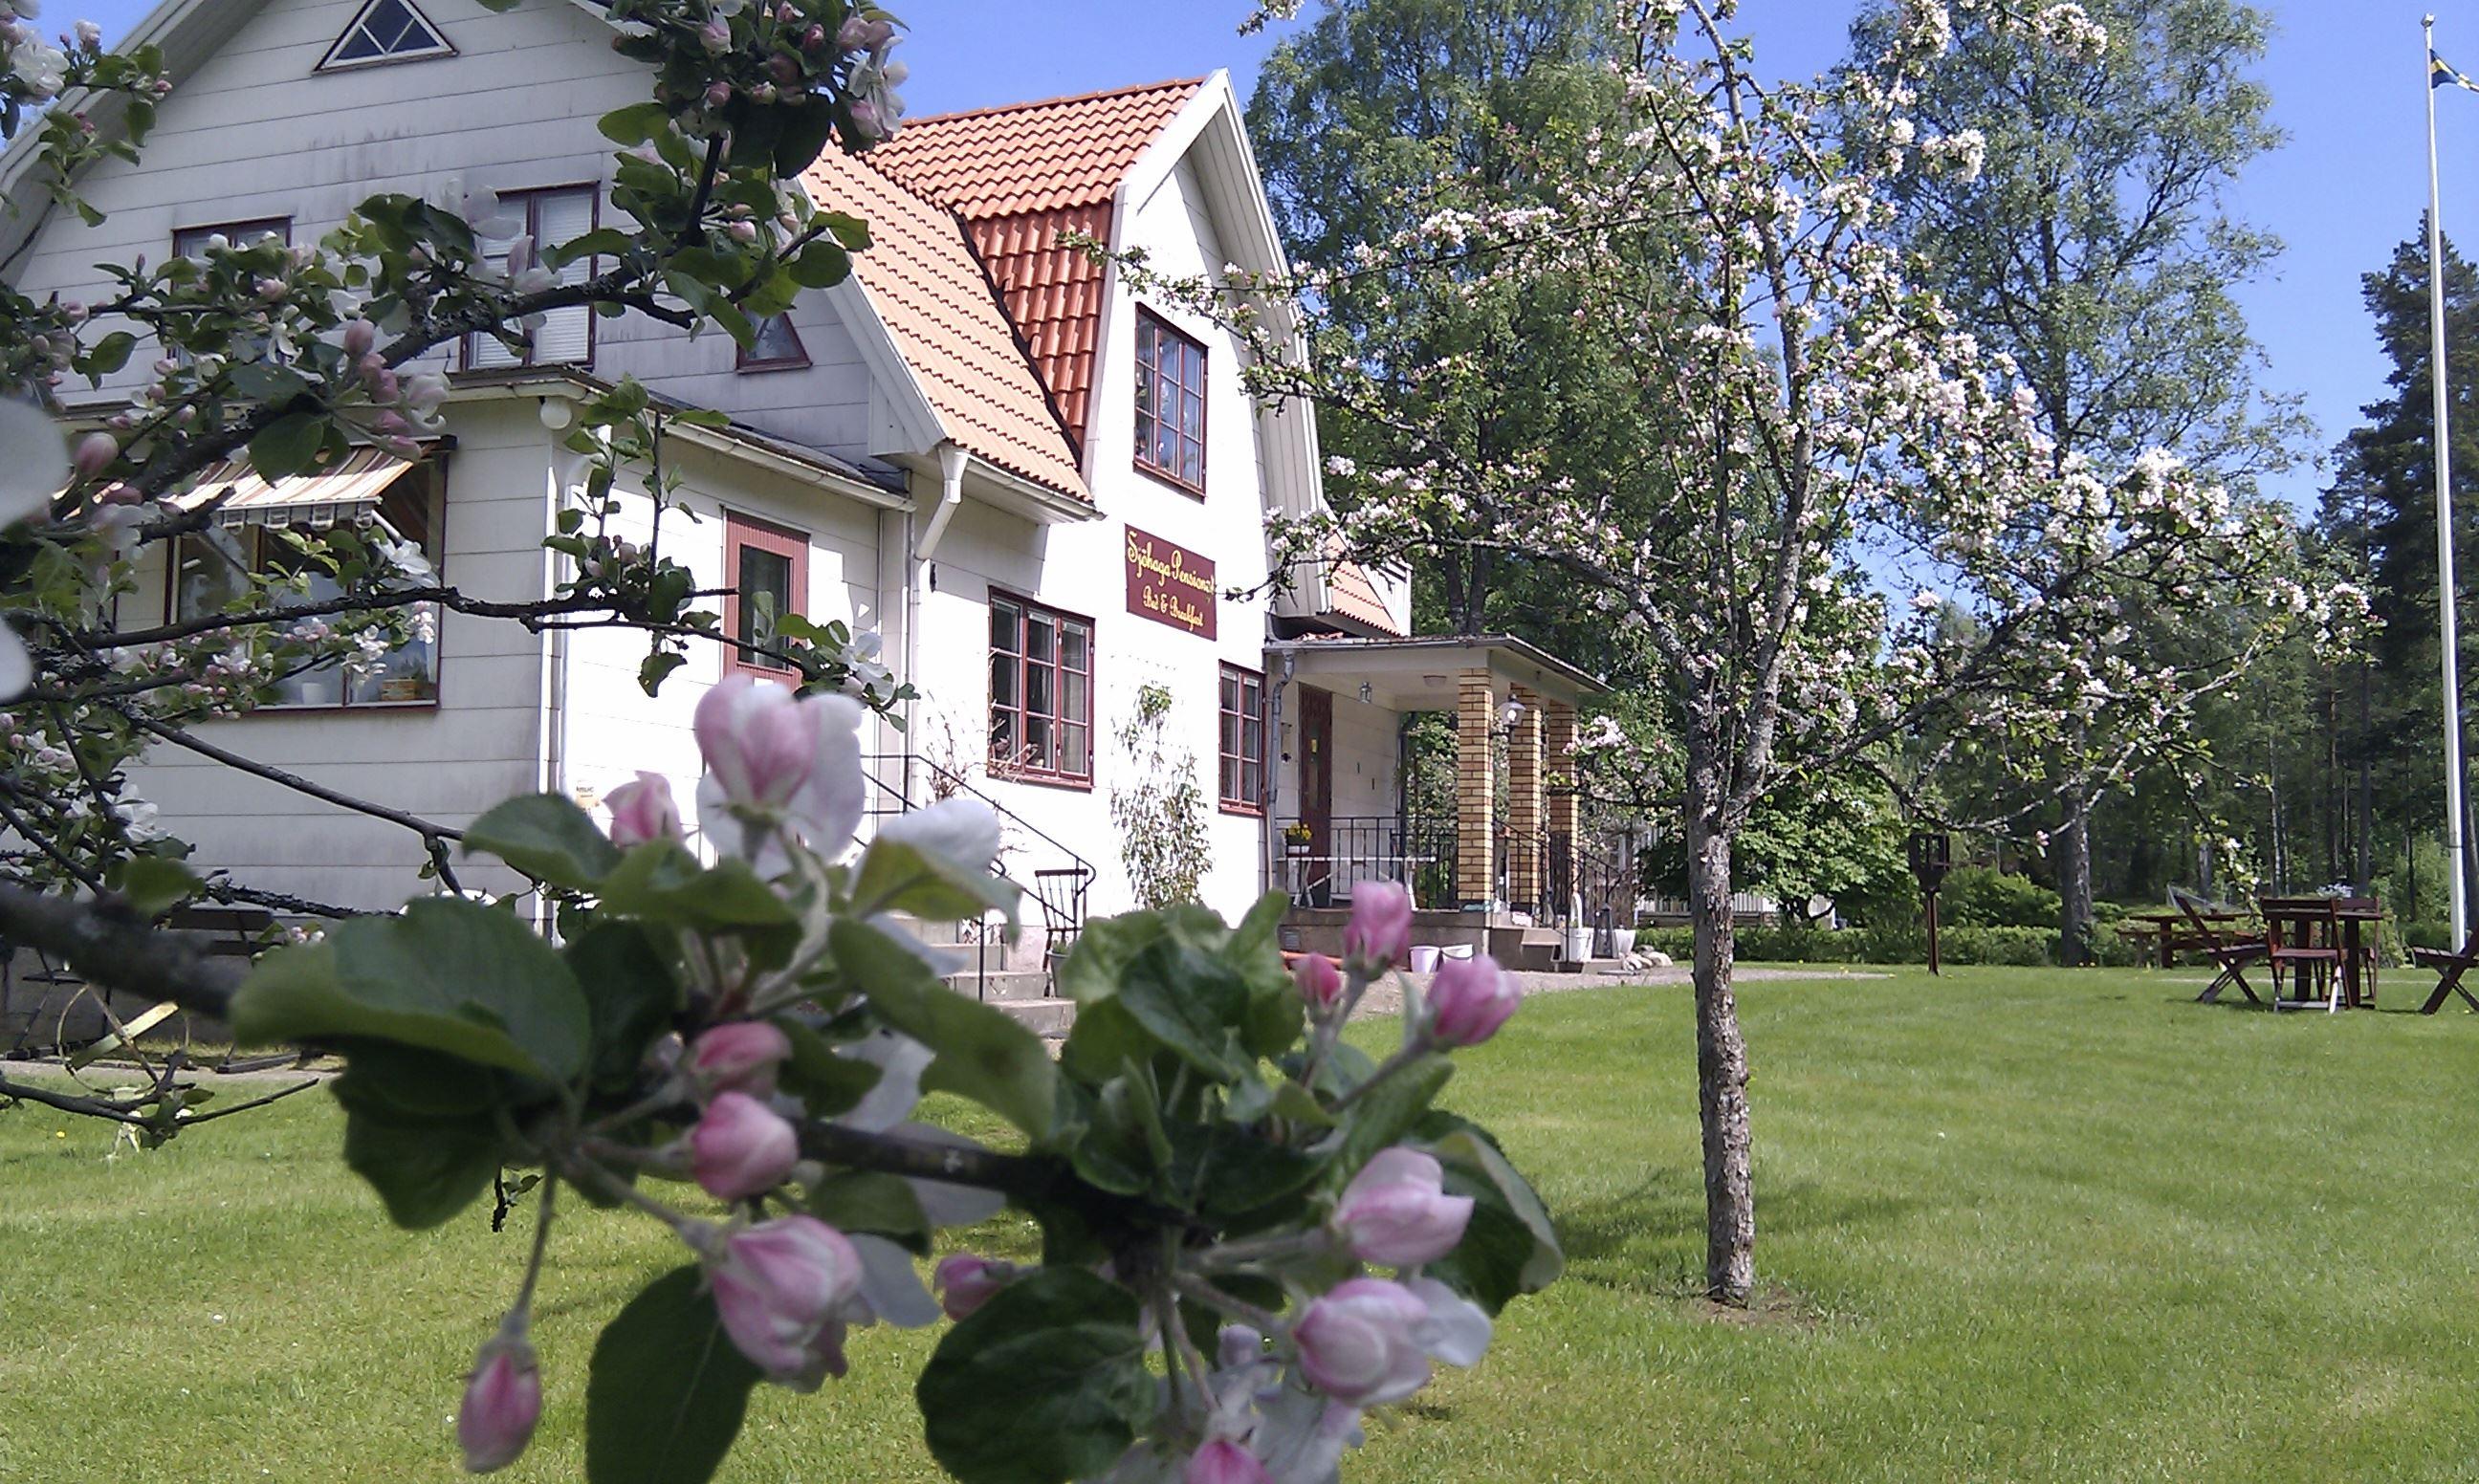 © sjöhaga pensionat, Sjöhaga Pensionat (copy)